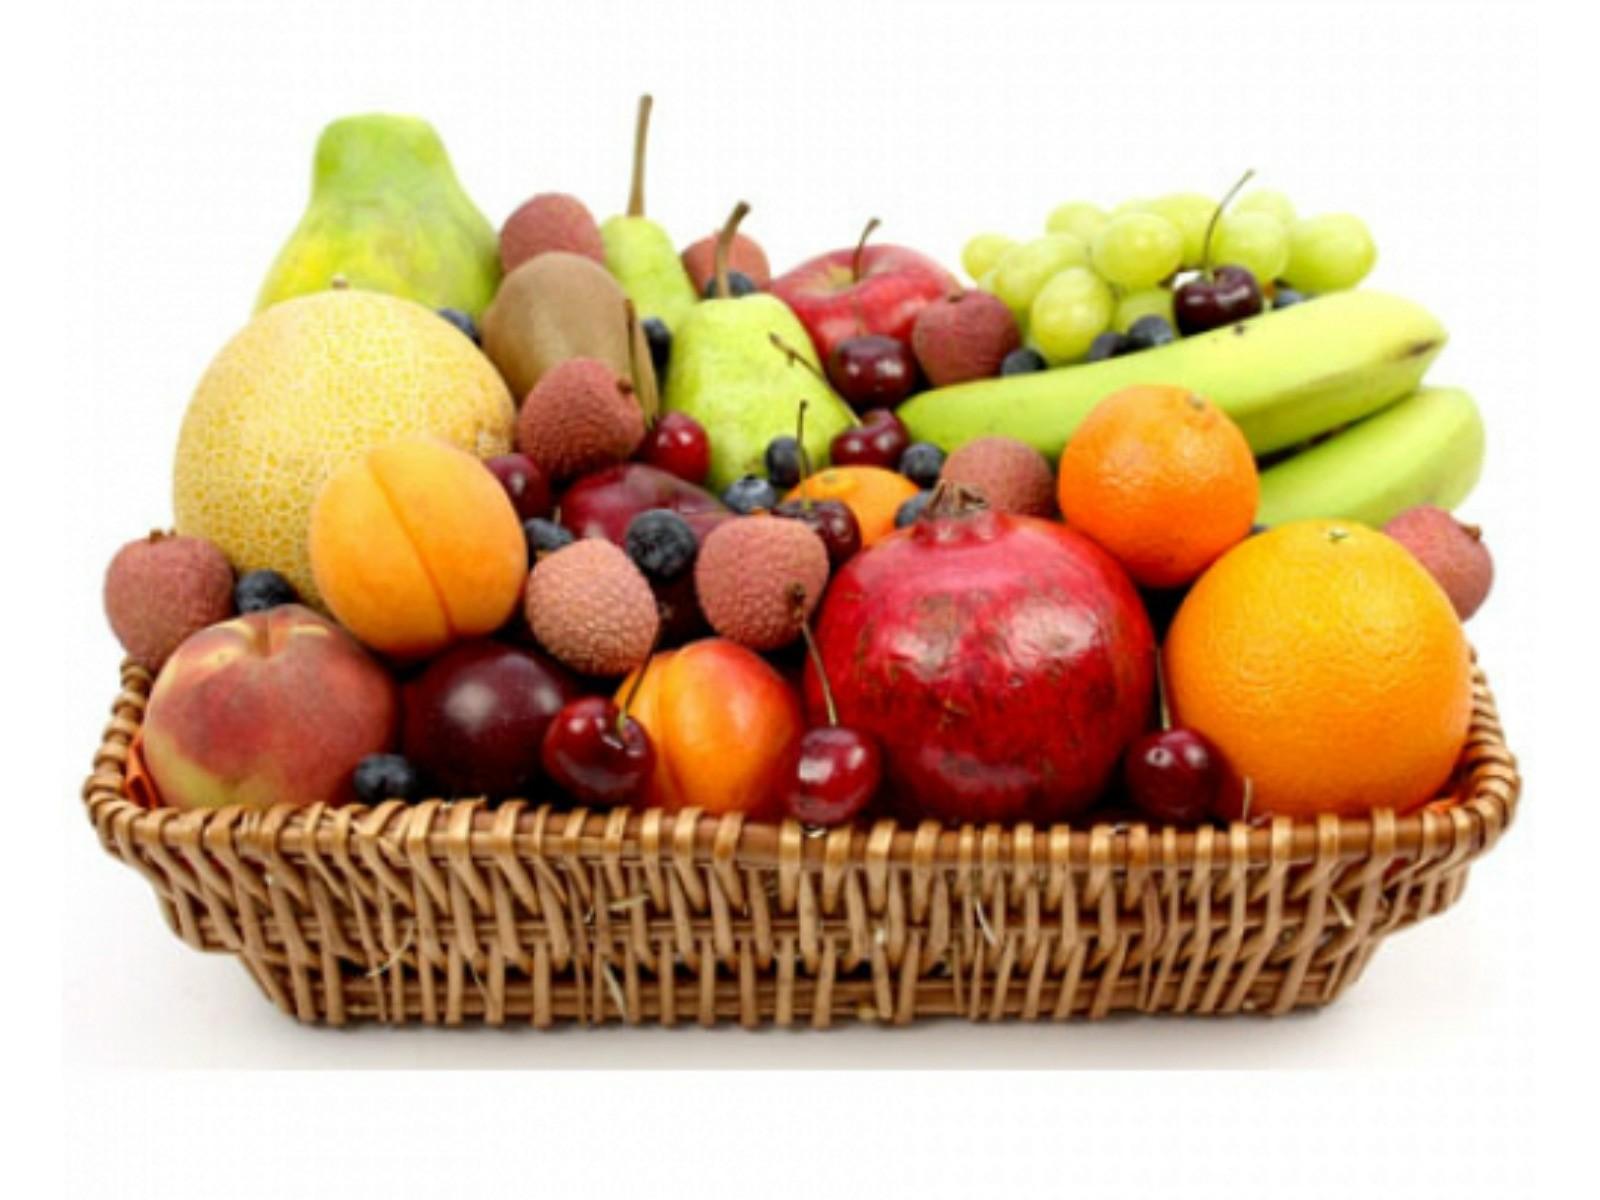 Fruit Basket Bristow Montessori School